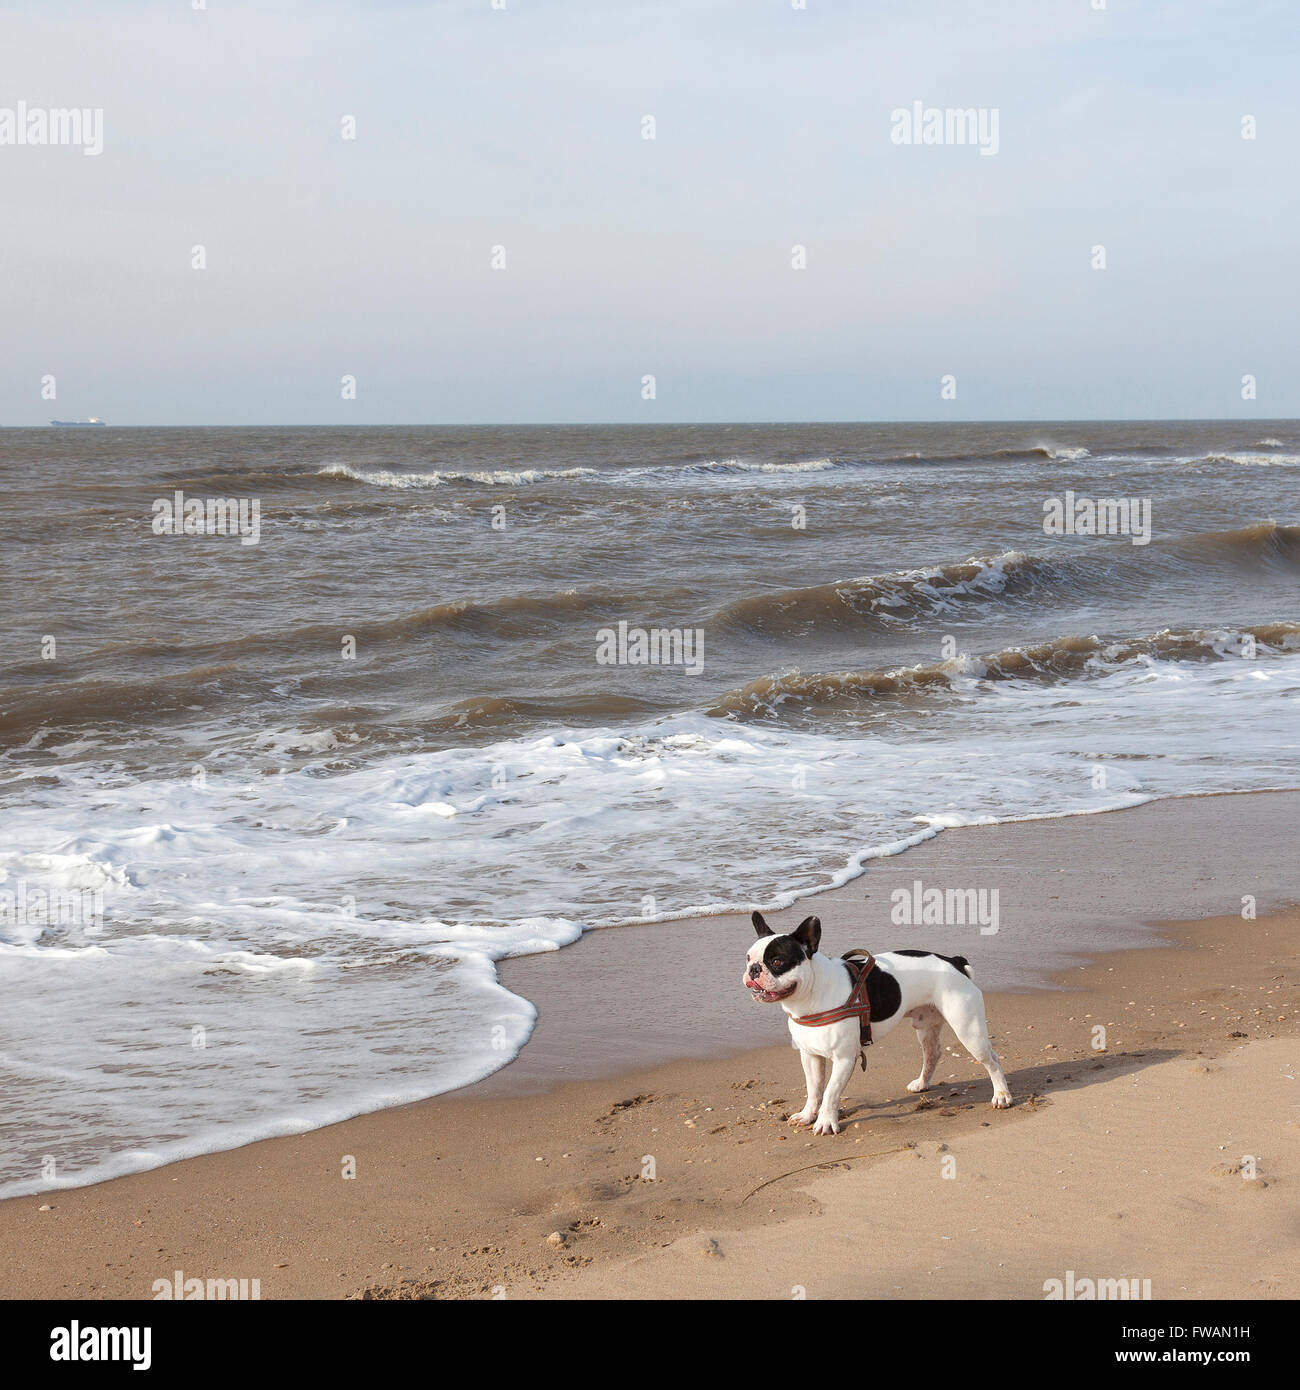 black and white pug dog on beach near surf - Stock Image